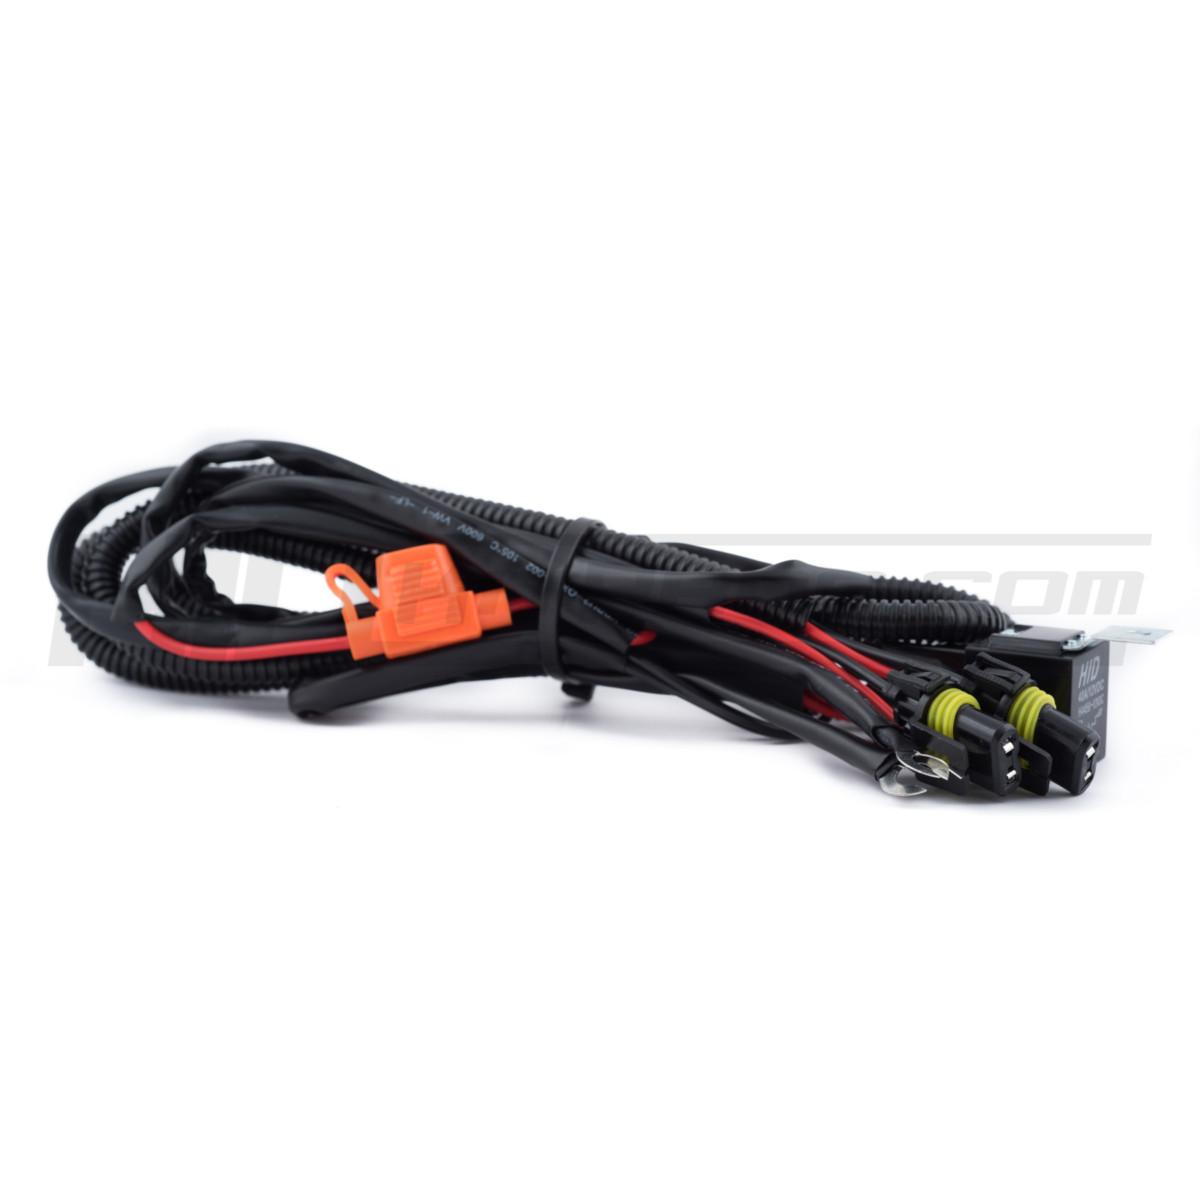 Universal Relay Harness Hid Led 35 55 Watt Wiring For Single Row Light Bar Xsurge Lights Hkp